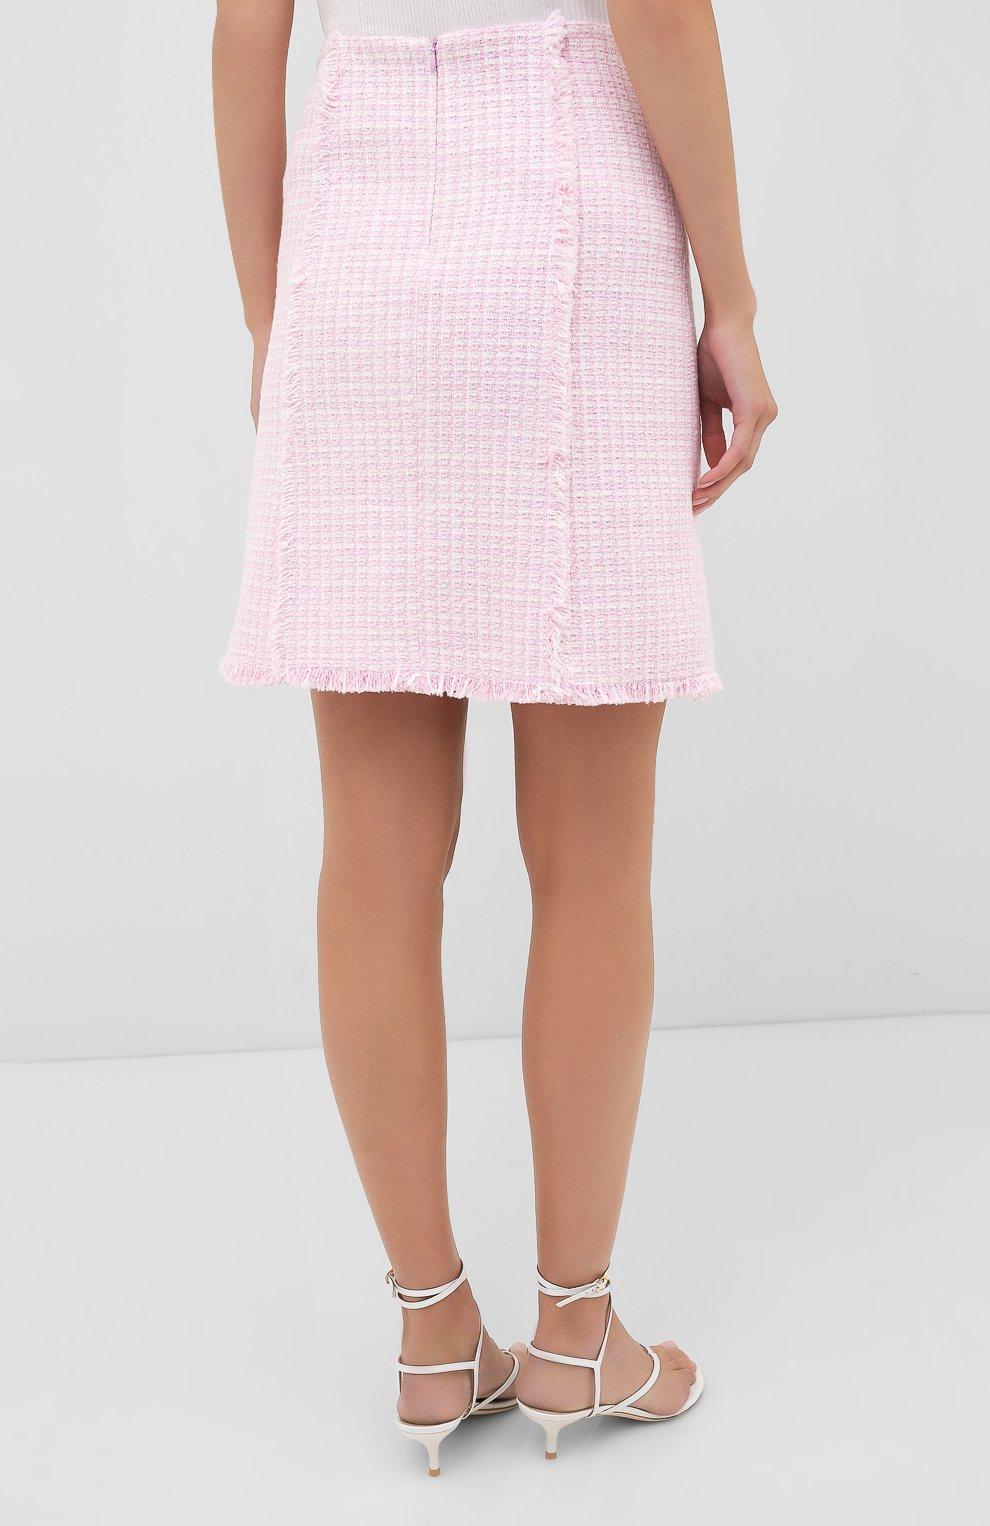 Женская юбка BOSS розового цвета, арт. 50434552 | Фото 4